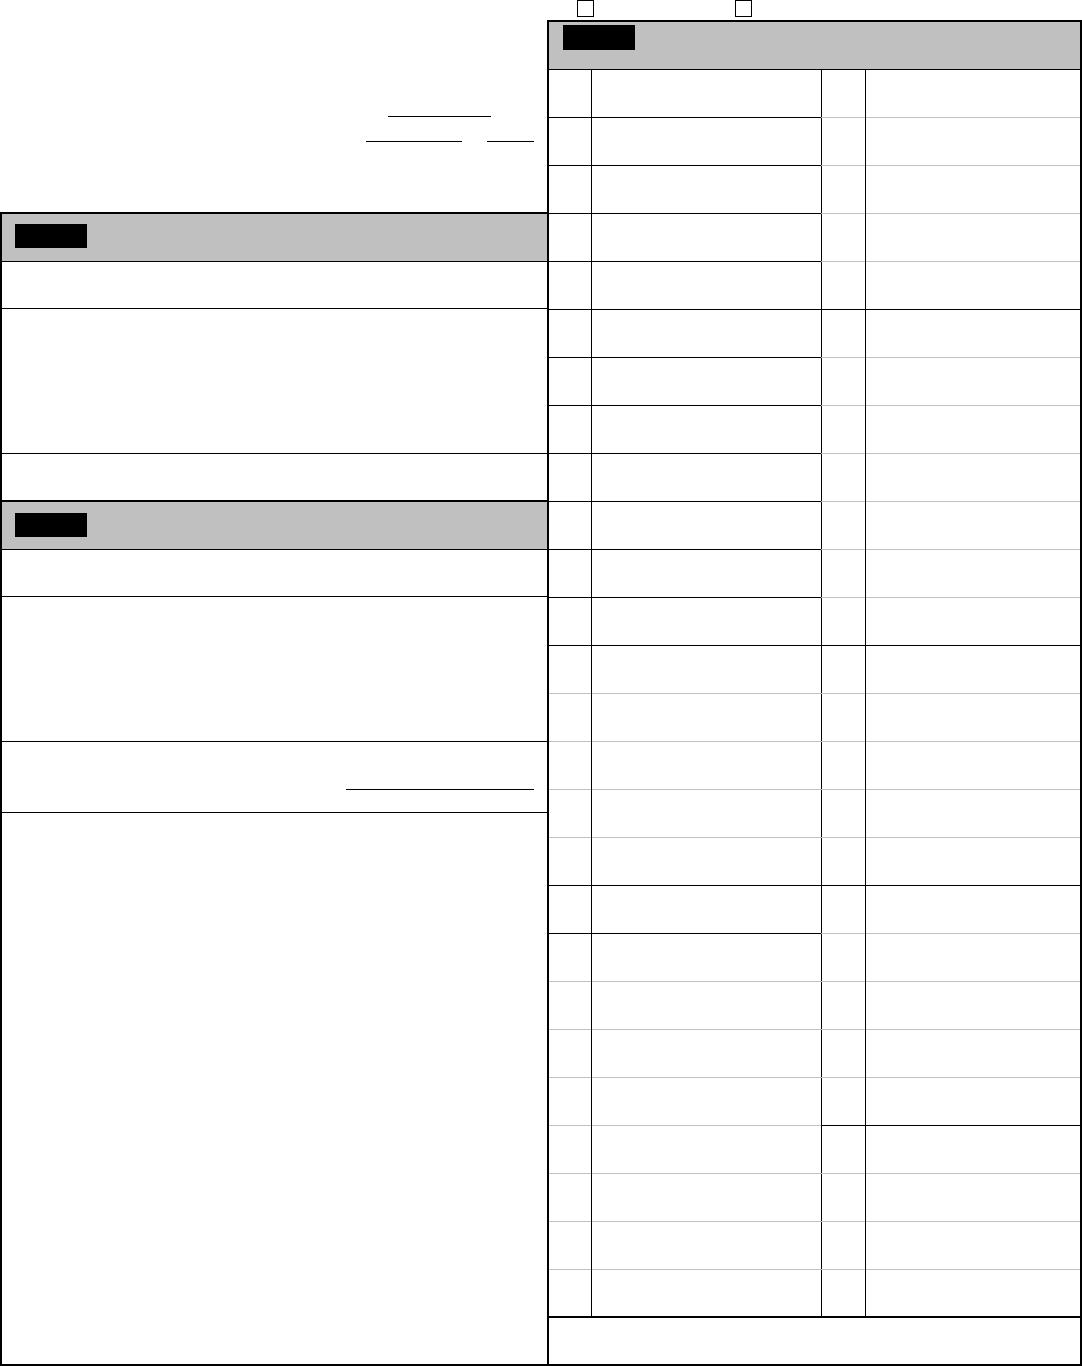 1120s schedule b instructions